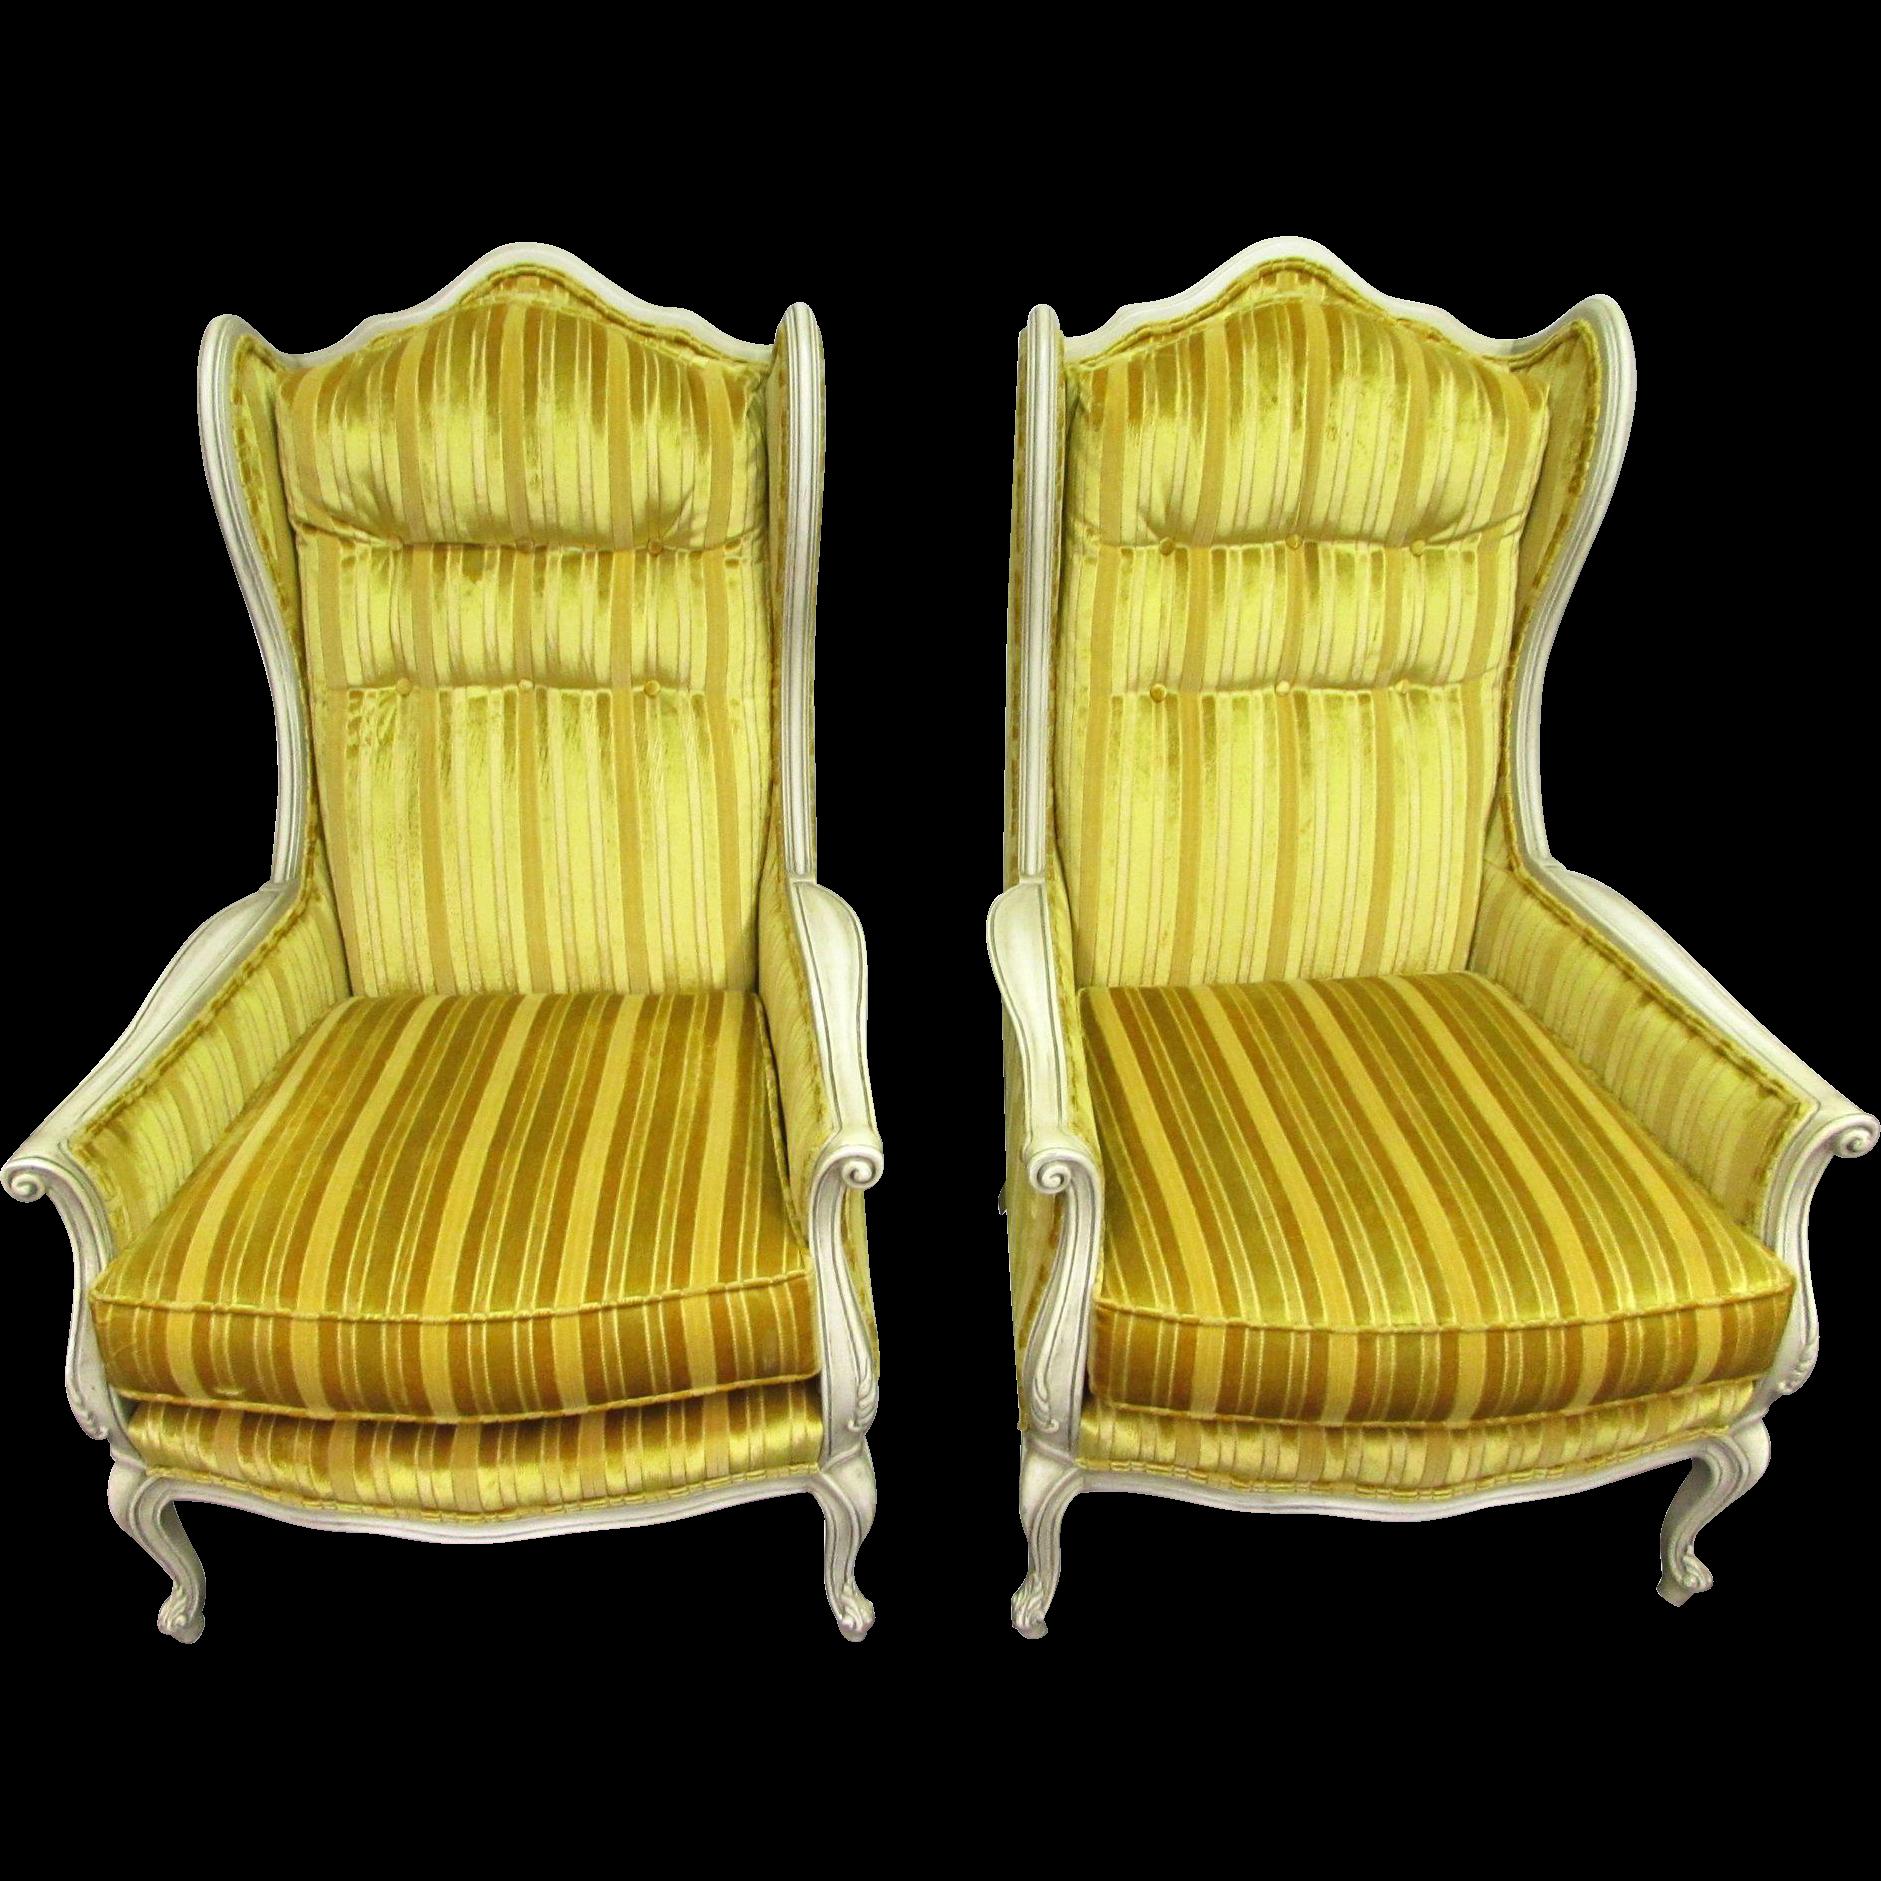 Pair of yellow velvet Art Nouveau chairs